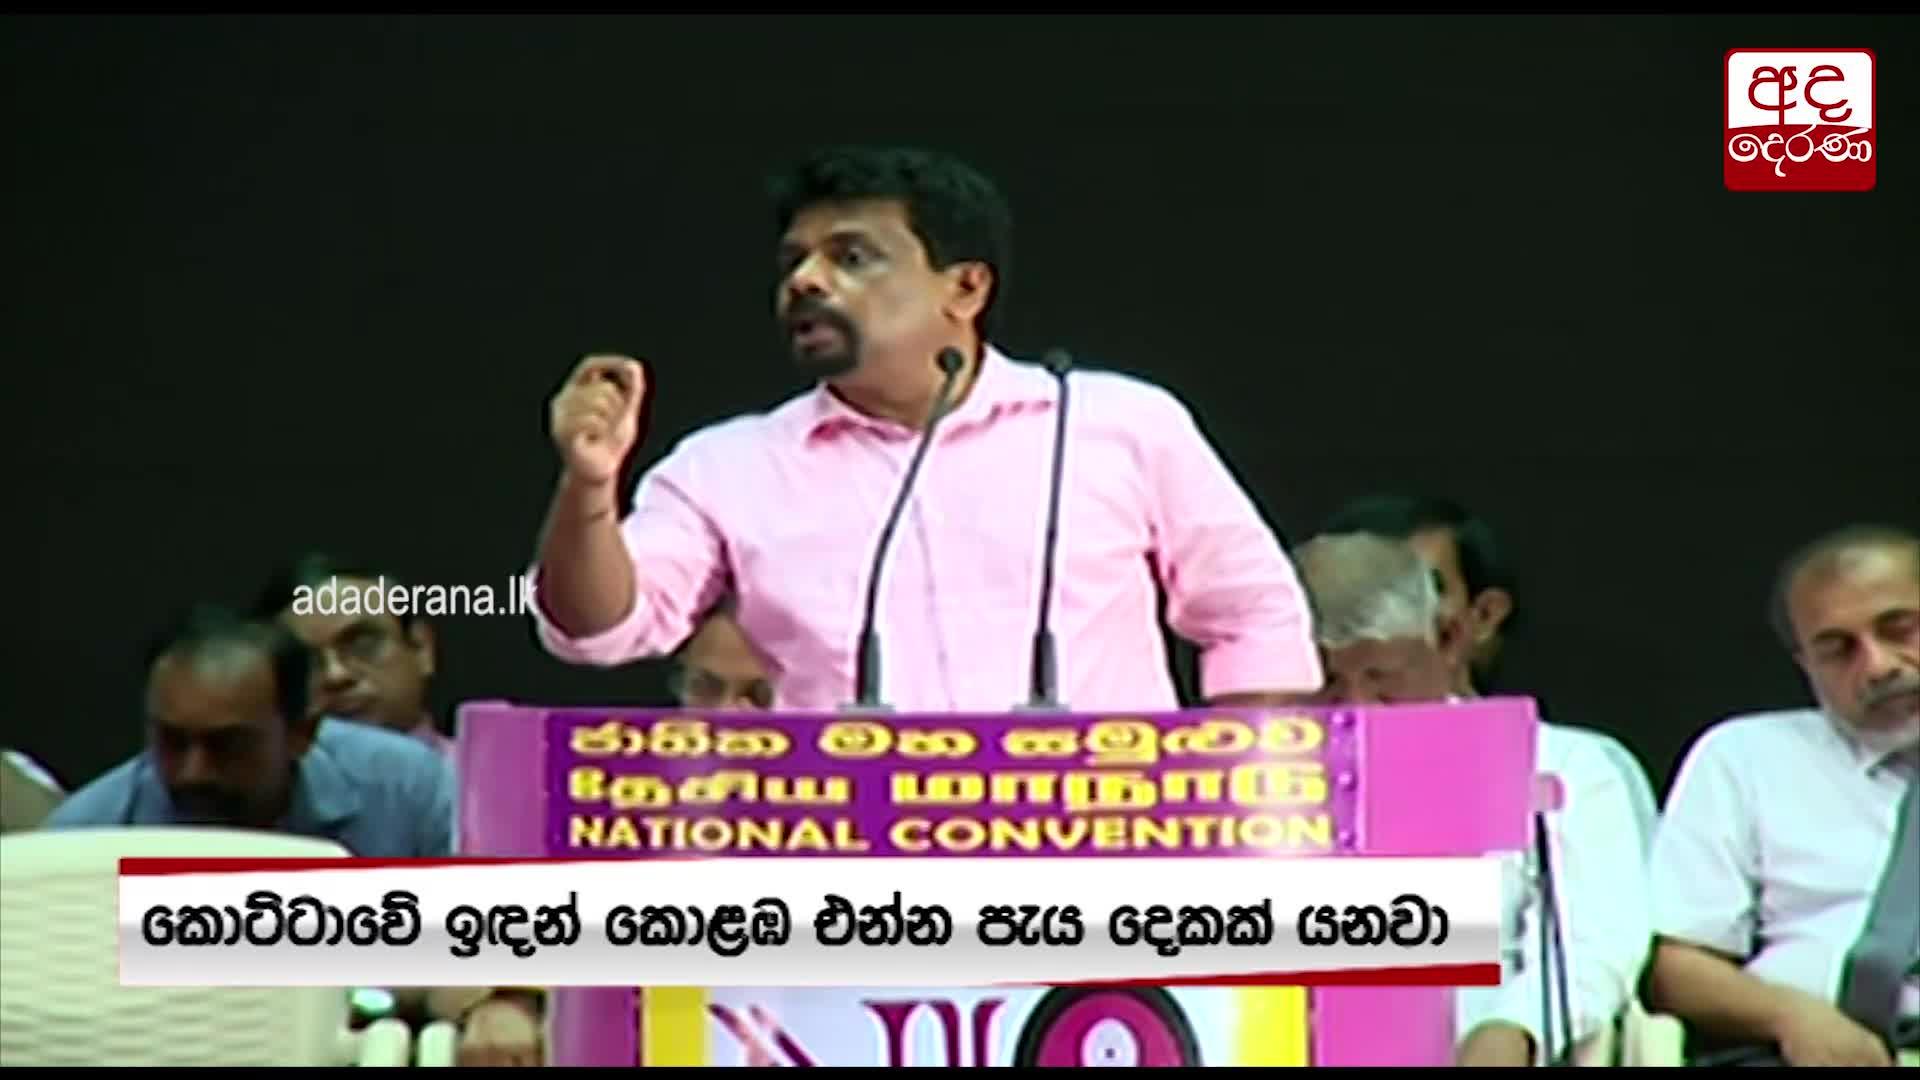 Sri Lanka branded as a country caught in debt trap - Anura Kumara